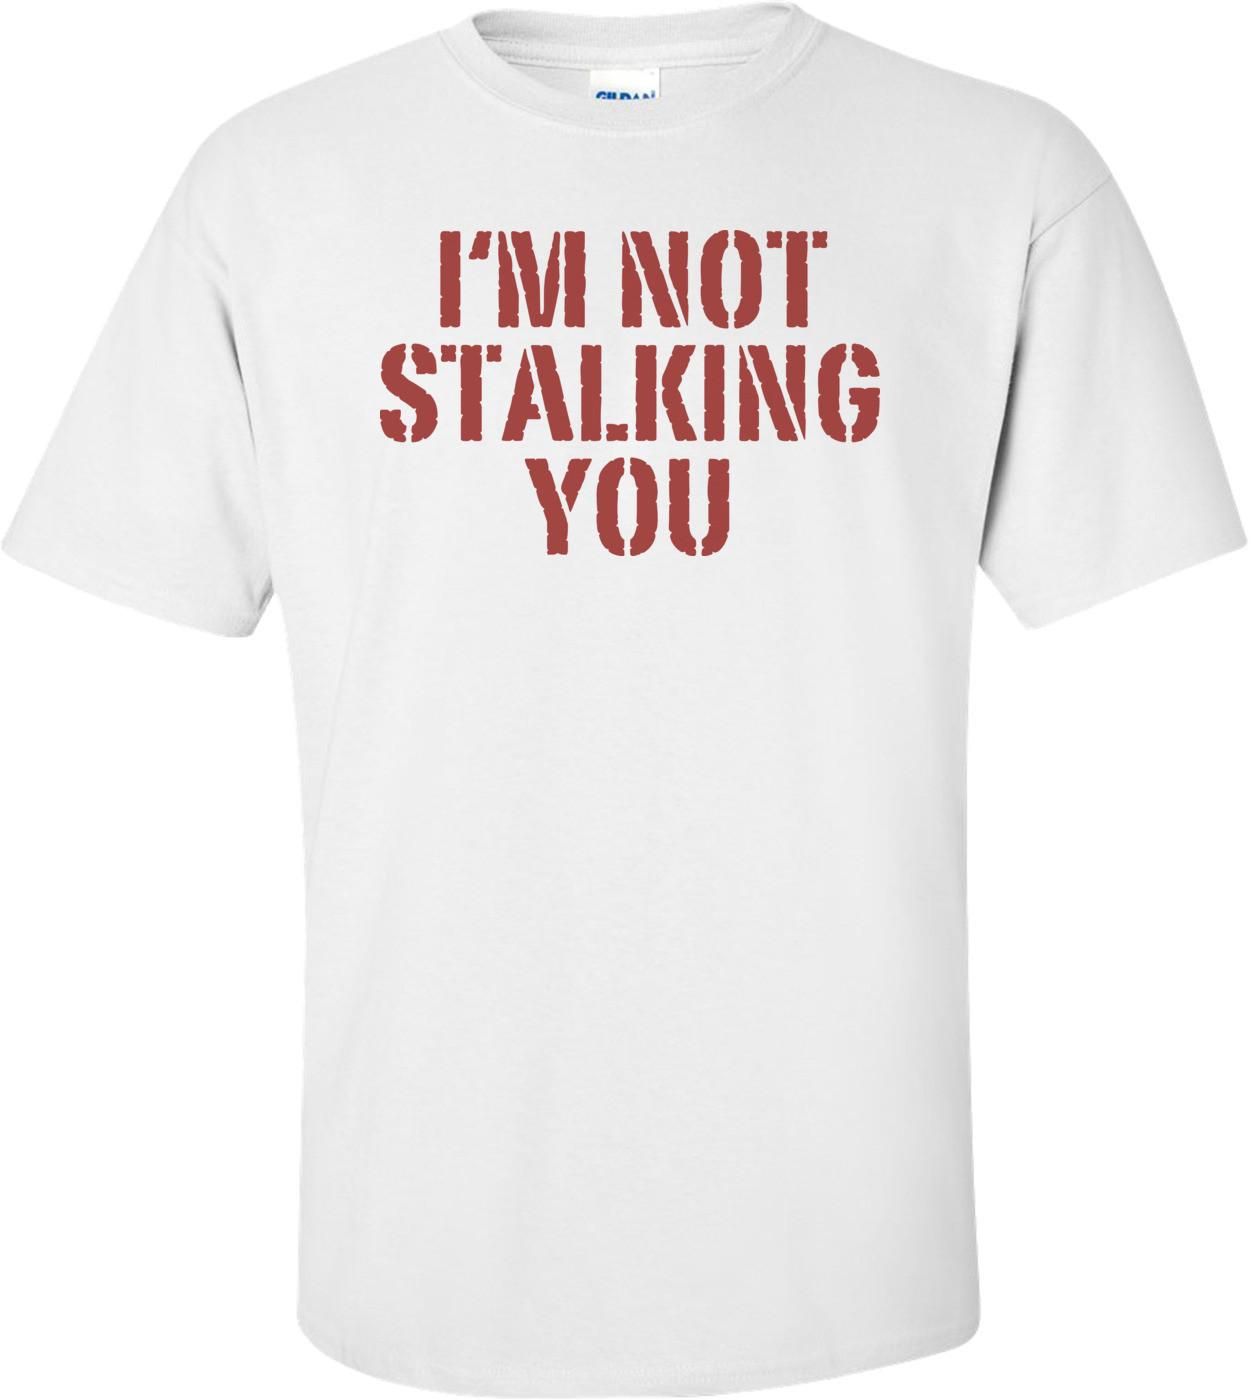 I'm Not Stalking You T-shirt